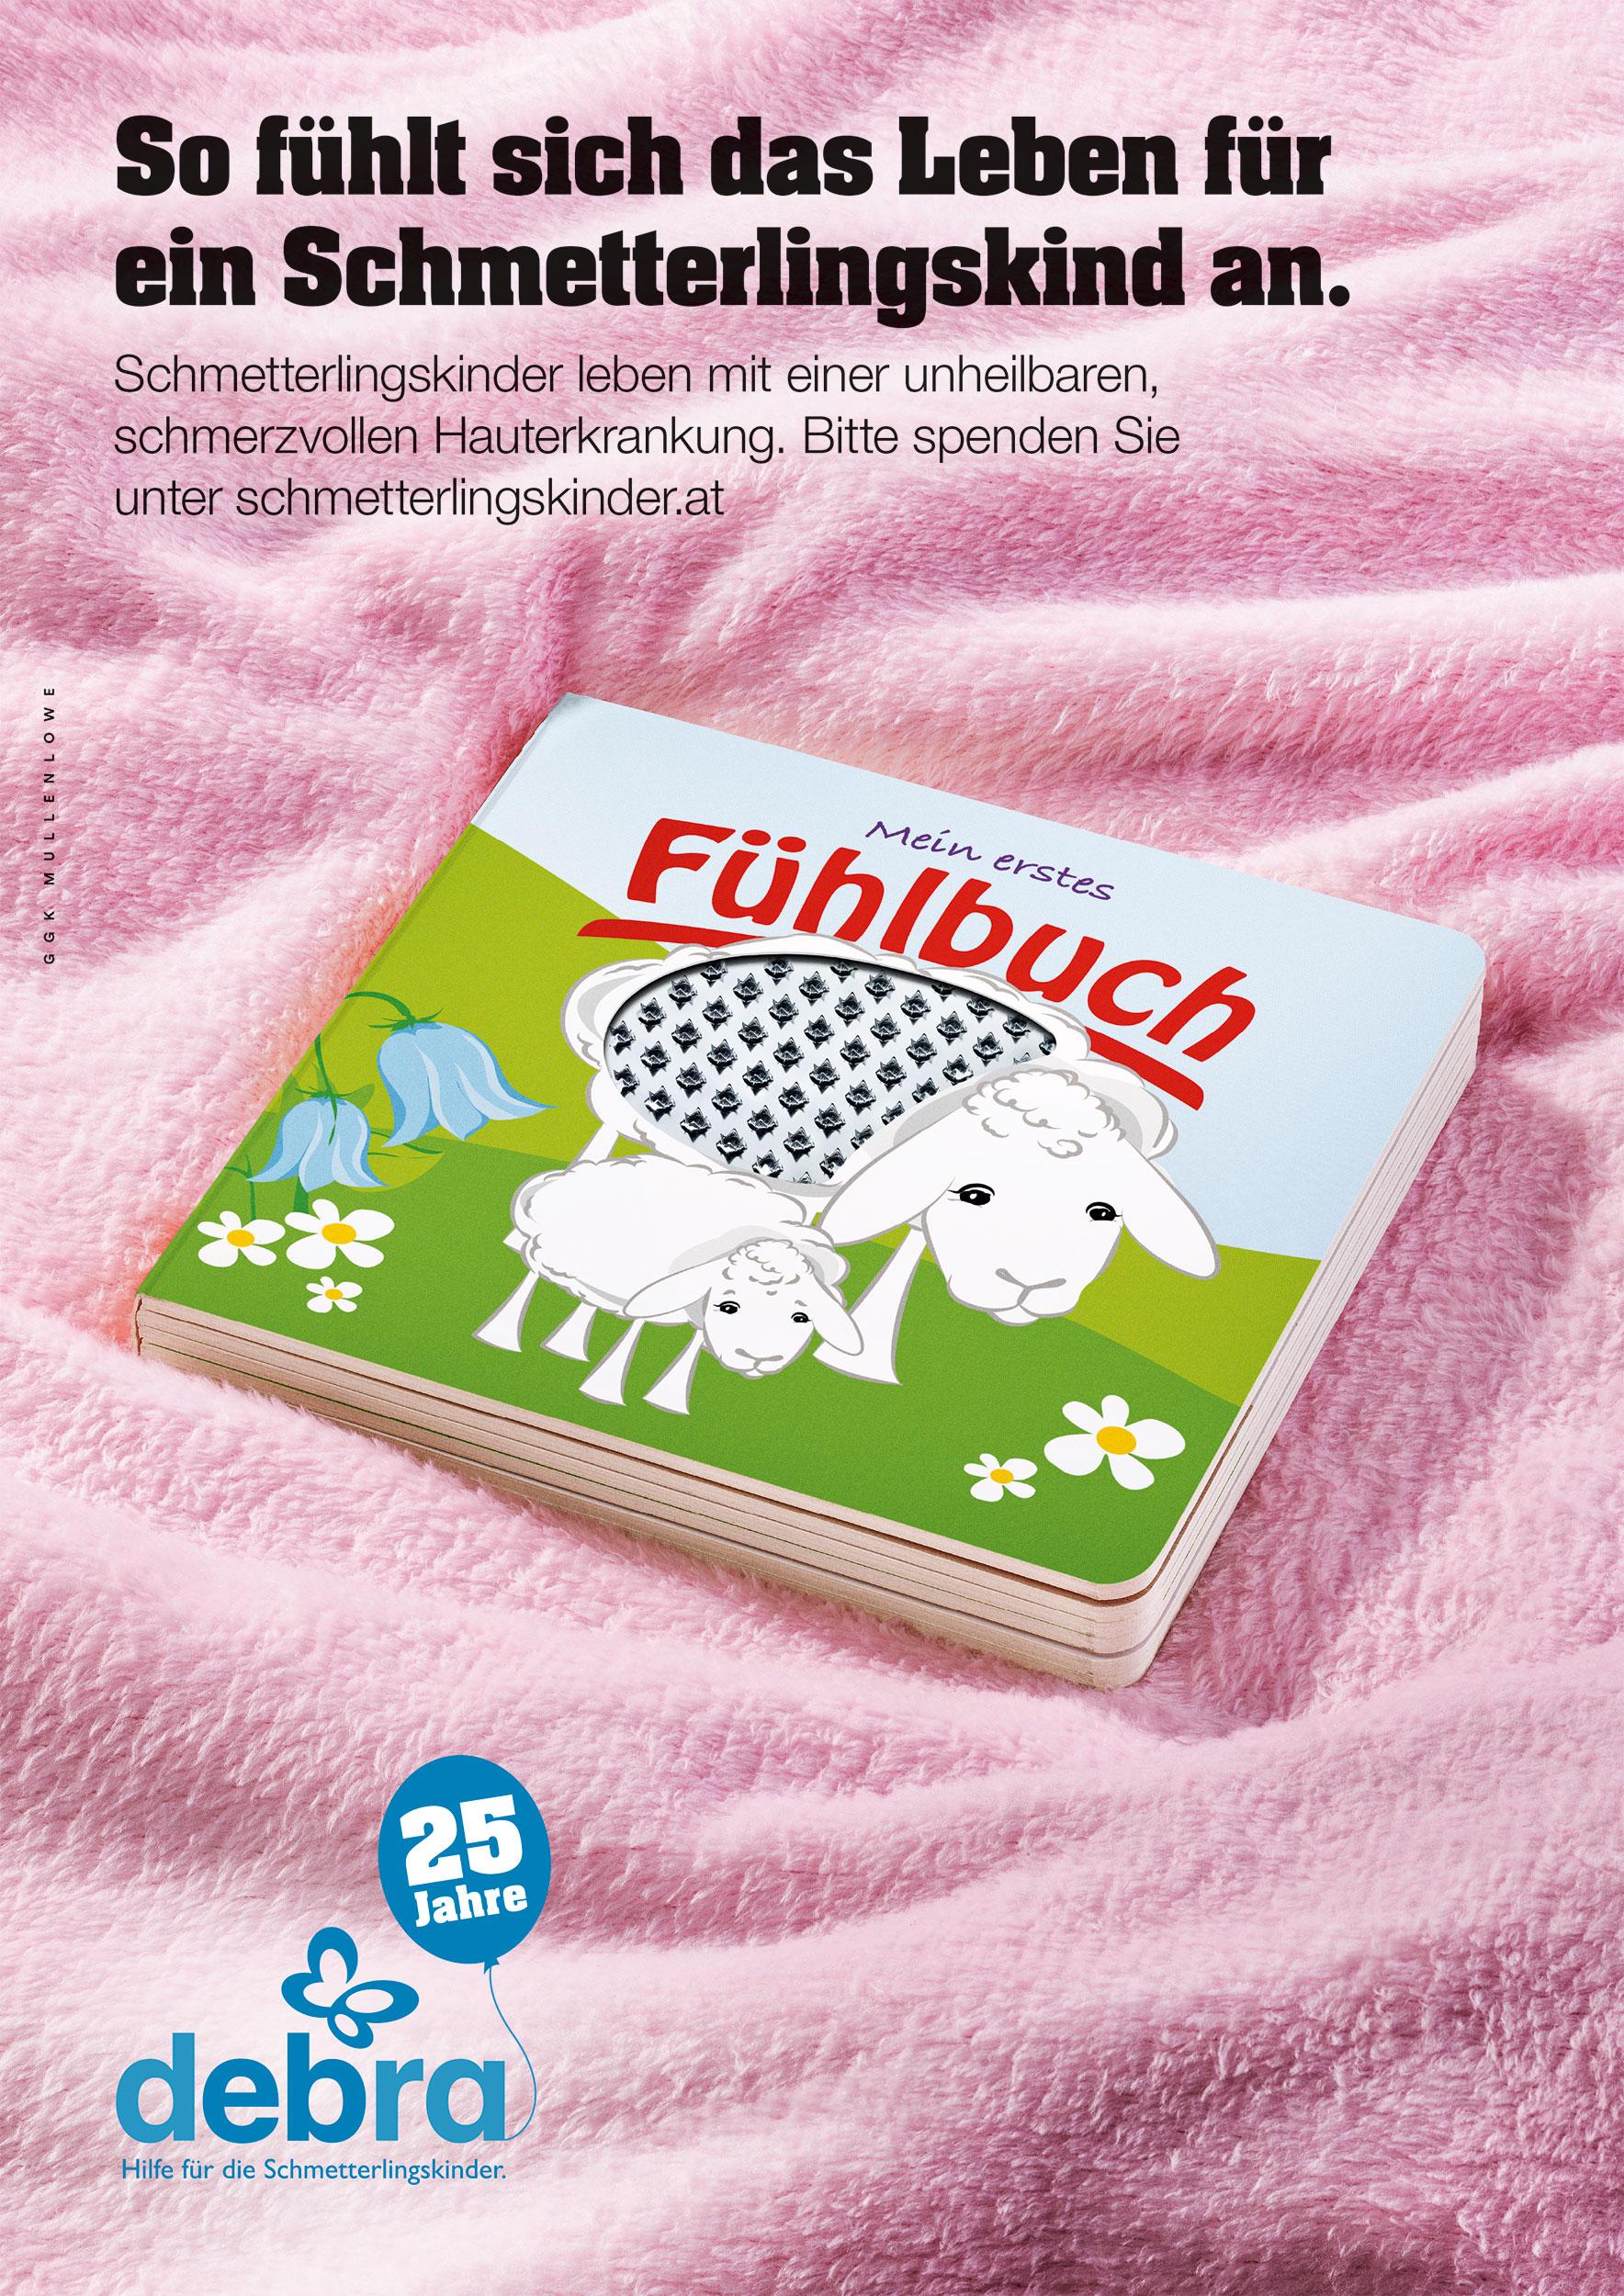 Blaupapier Fotografie Cgi Bildretusche Litho Debra Fuehlbuch Poster